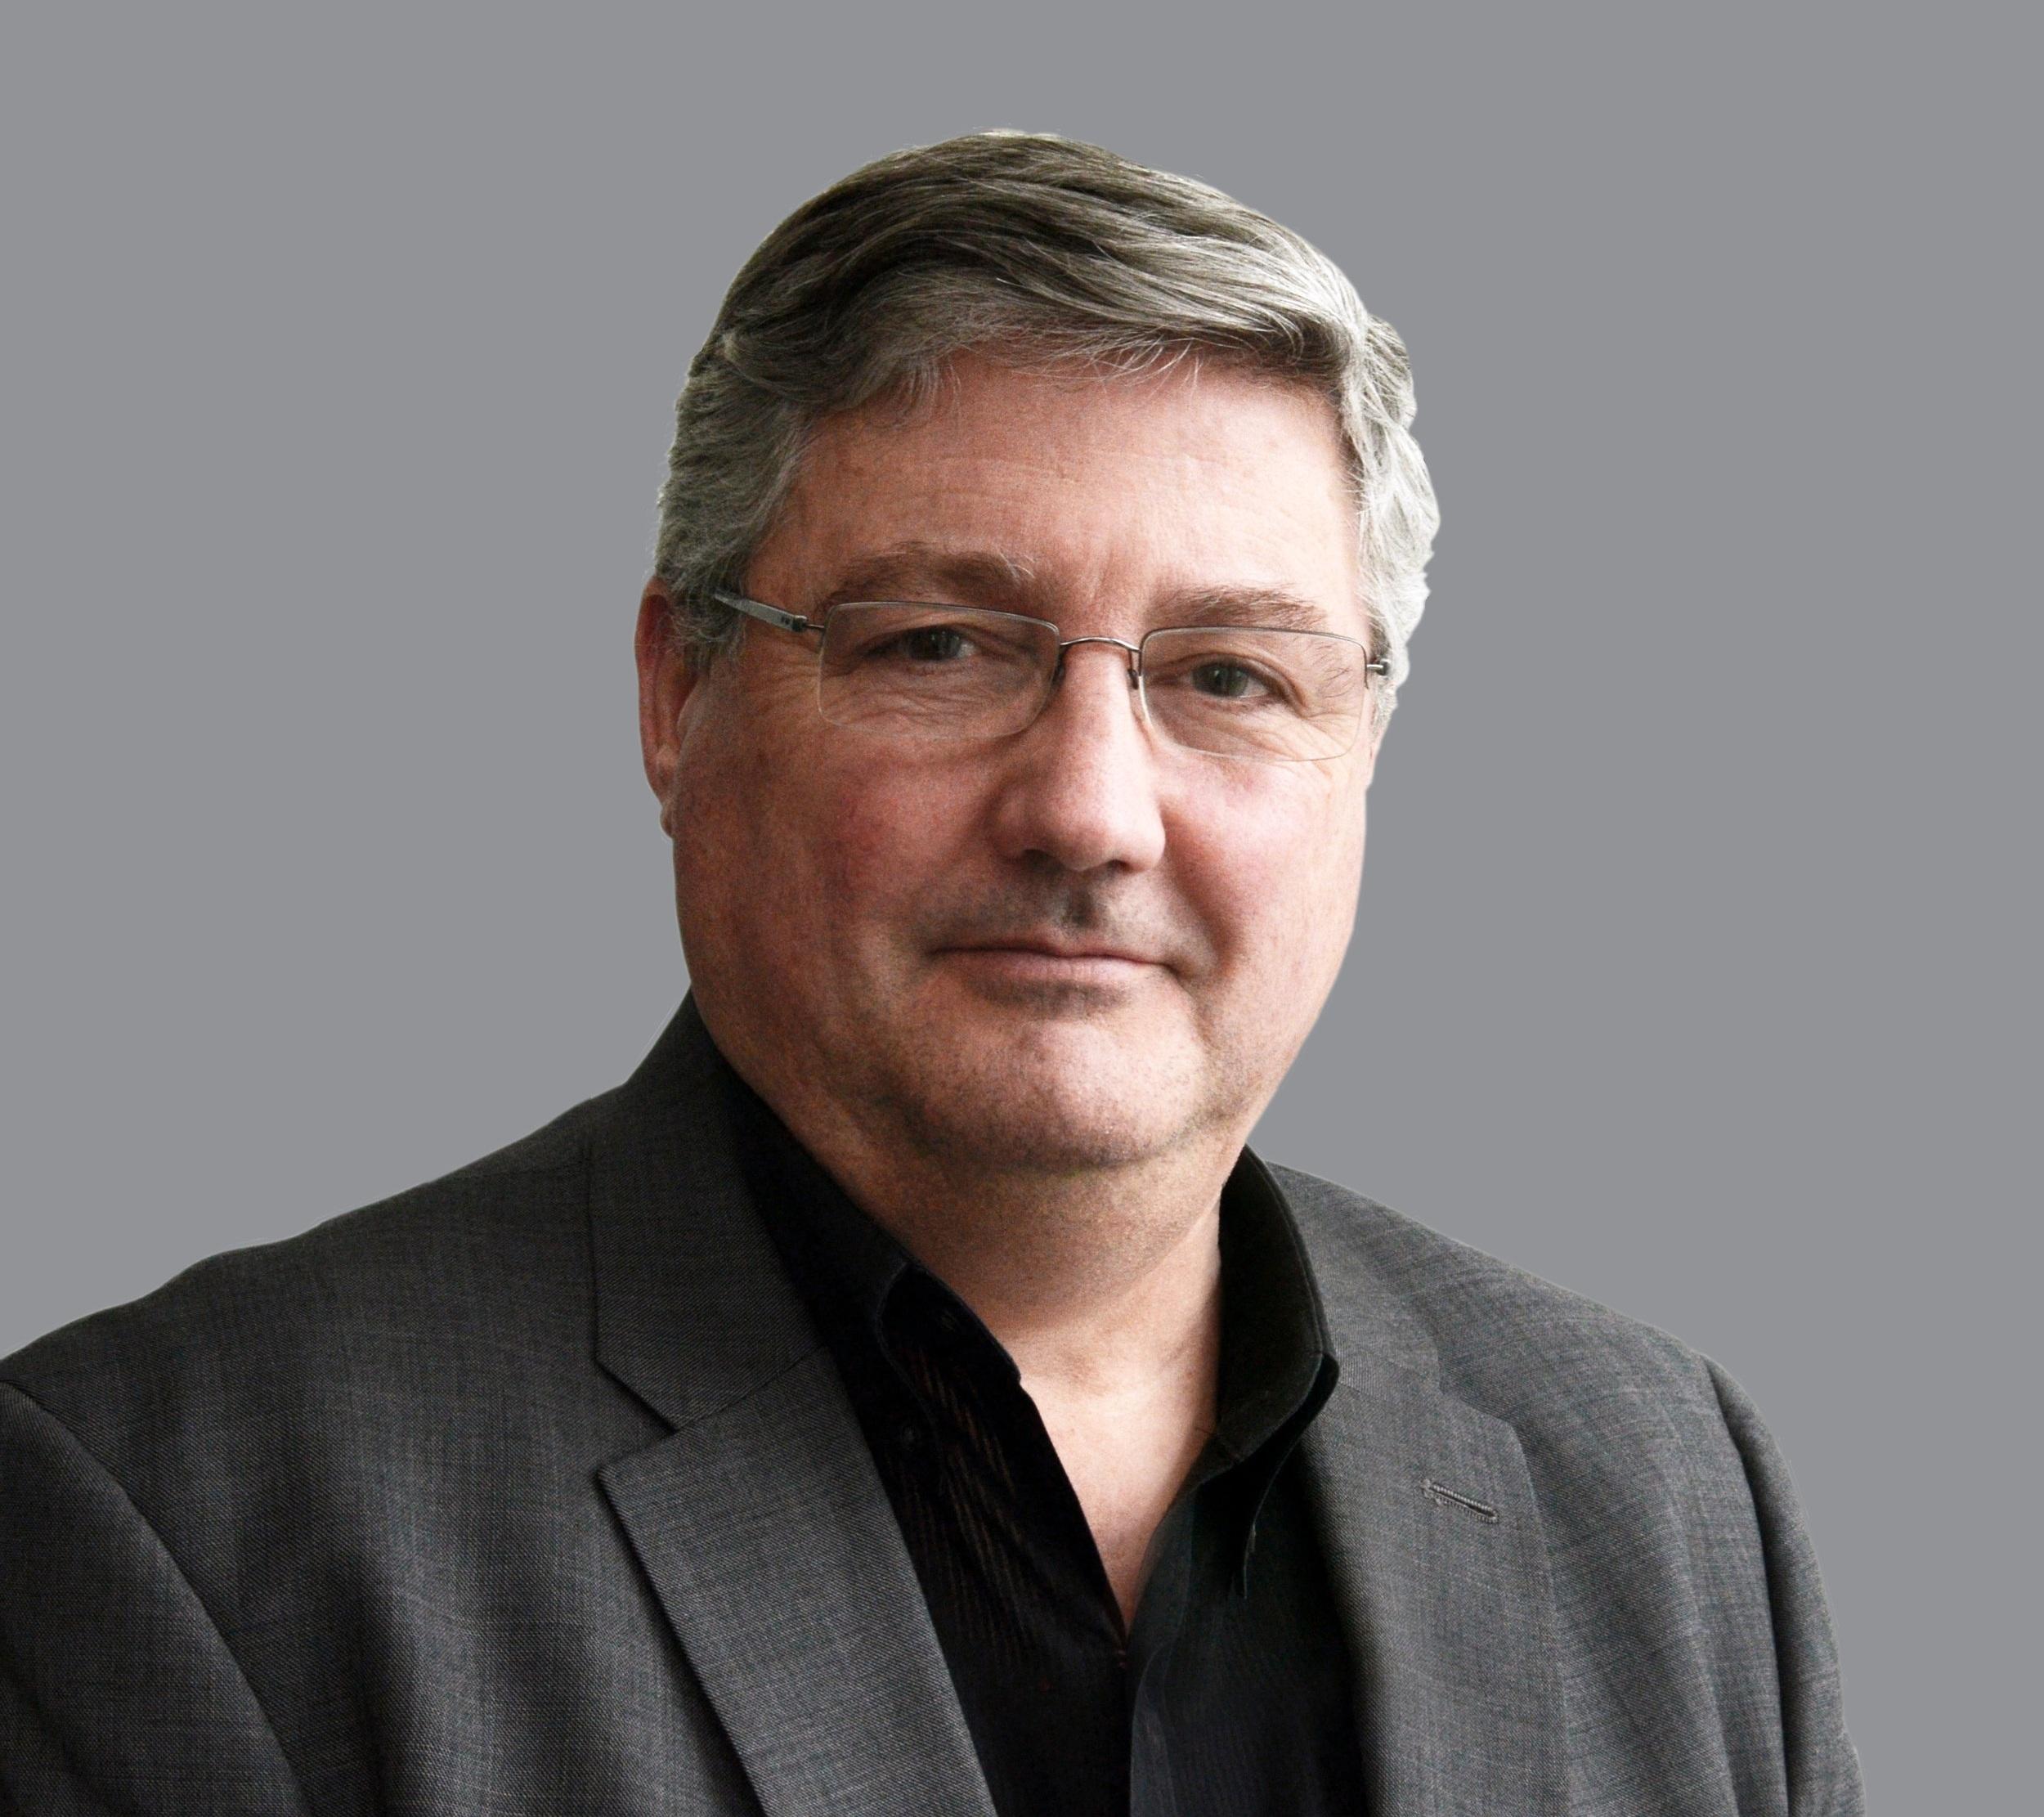 Robert G. Little, Jr., AIA Senior Design Principal